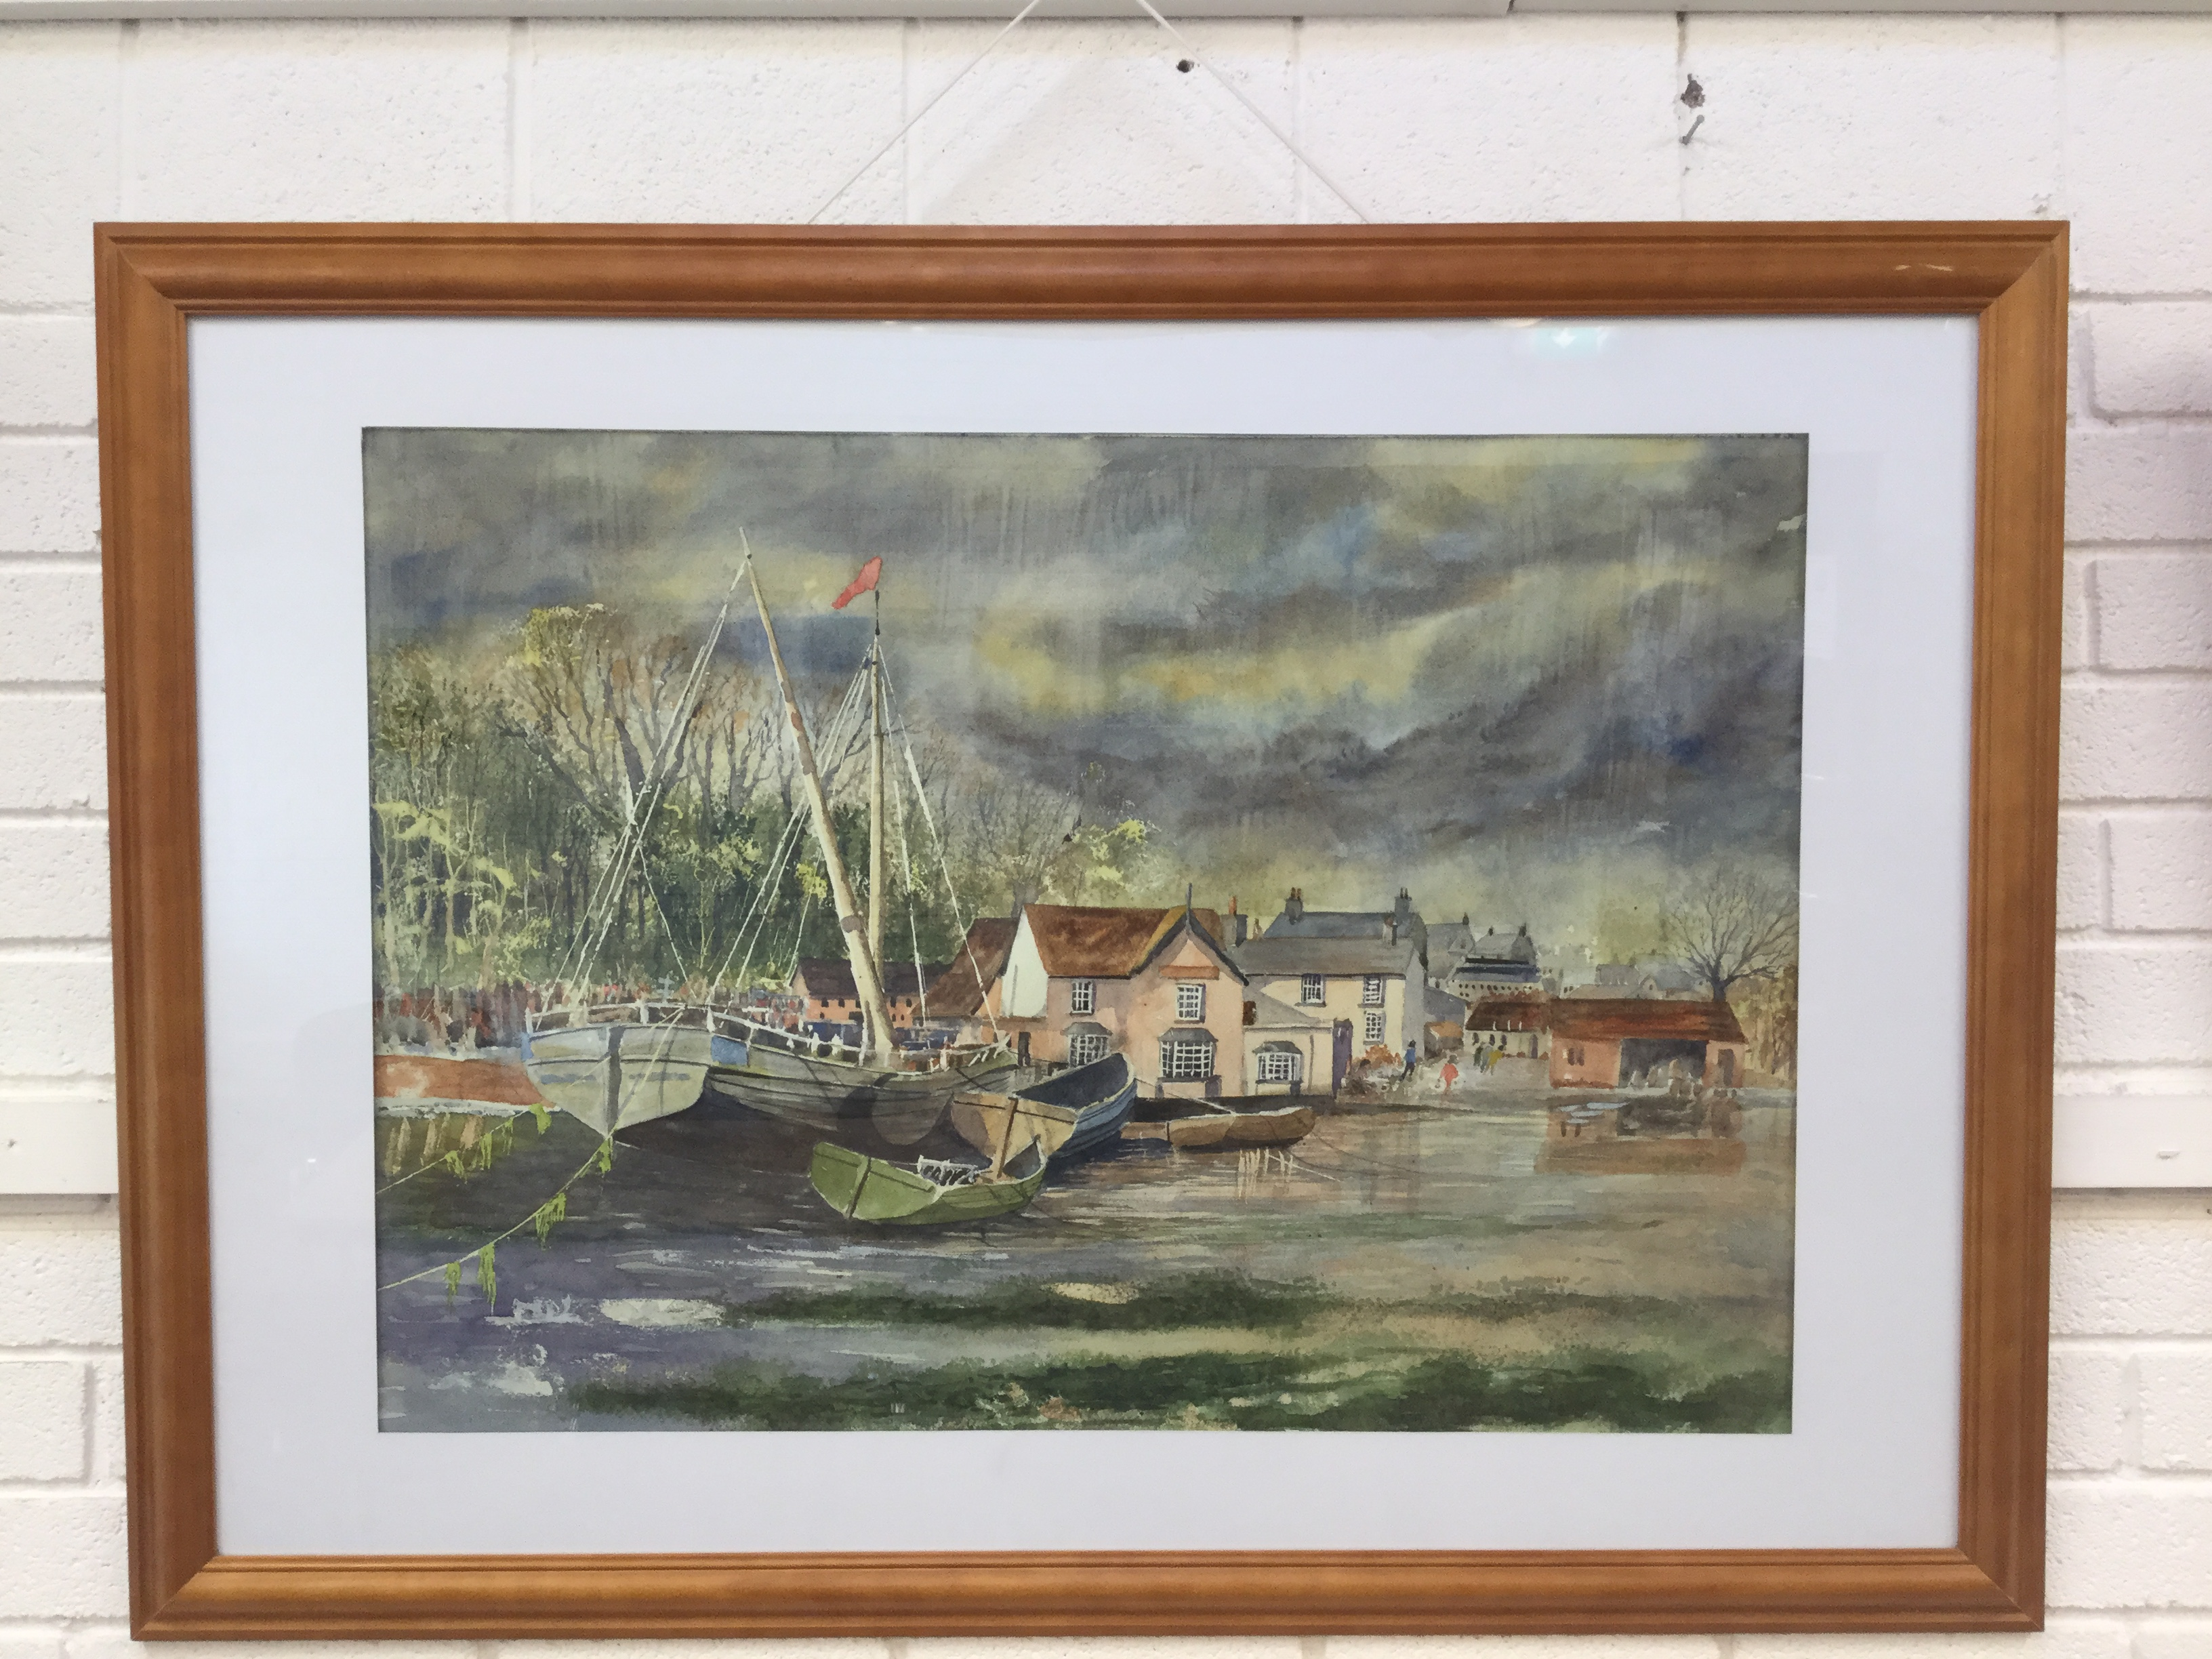 Exhibition In Roscrea Library By Noel Morrissey And Lisa Gedigk